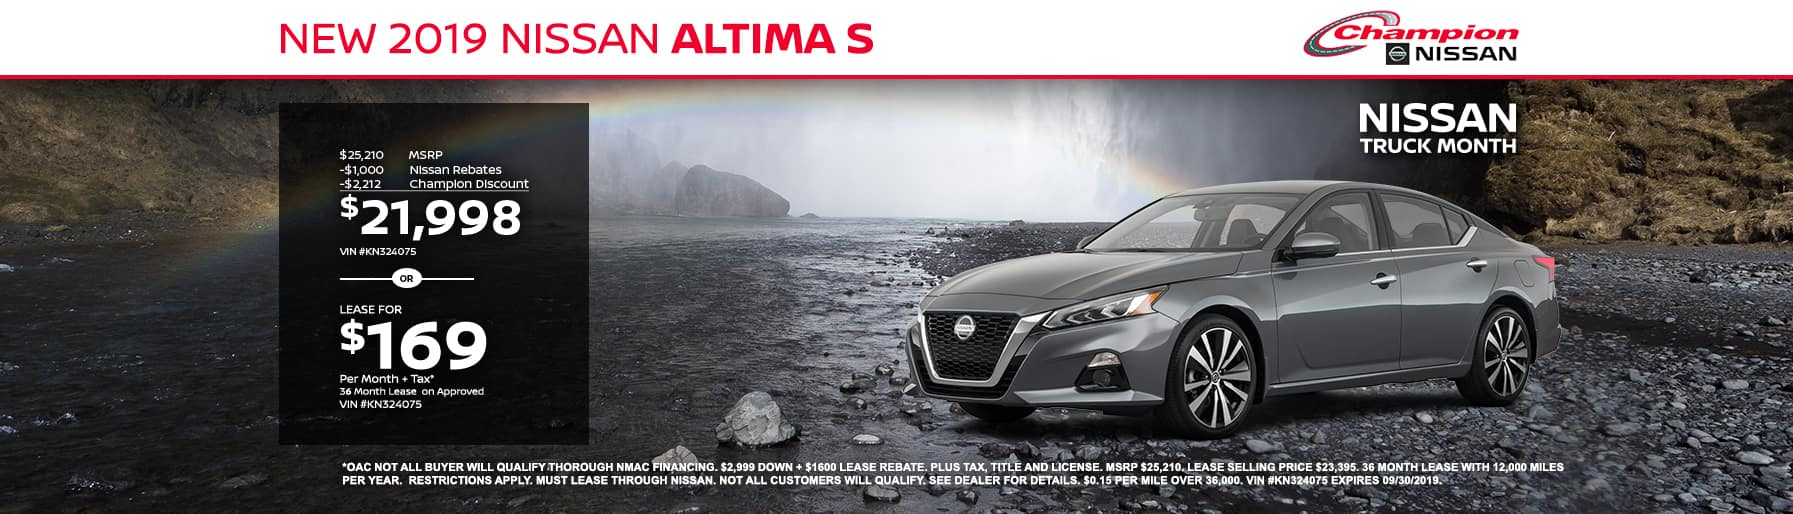 desktop TK 2019 Nissan Altima